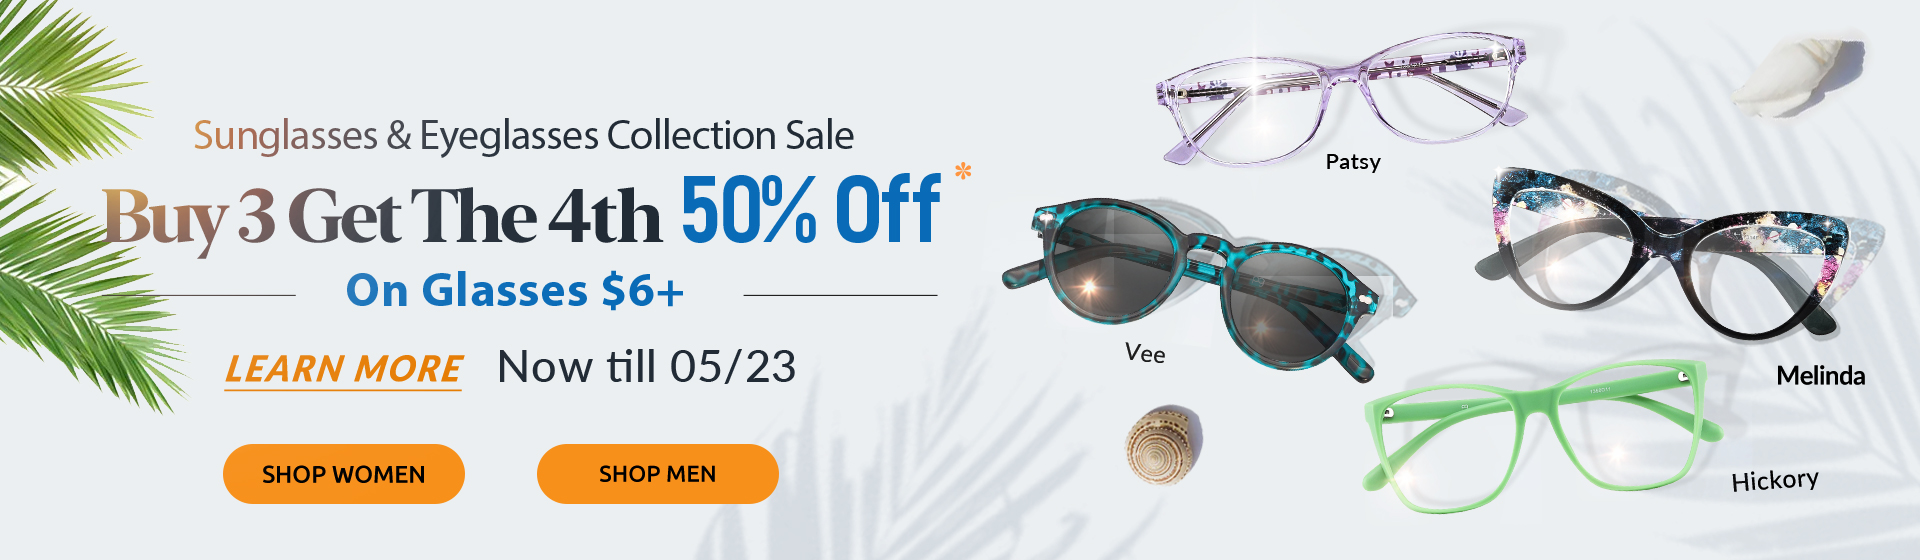 The big summer sale